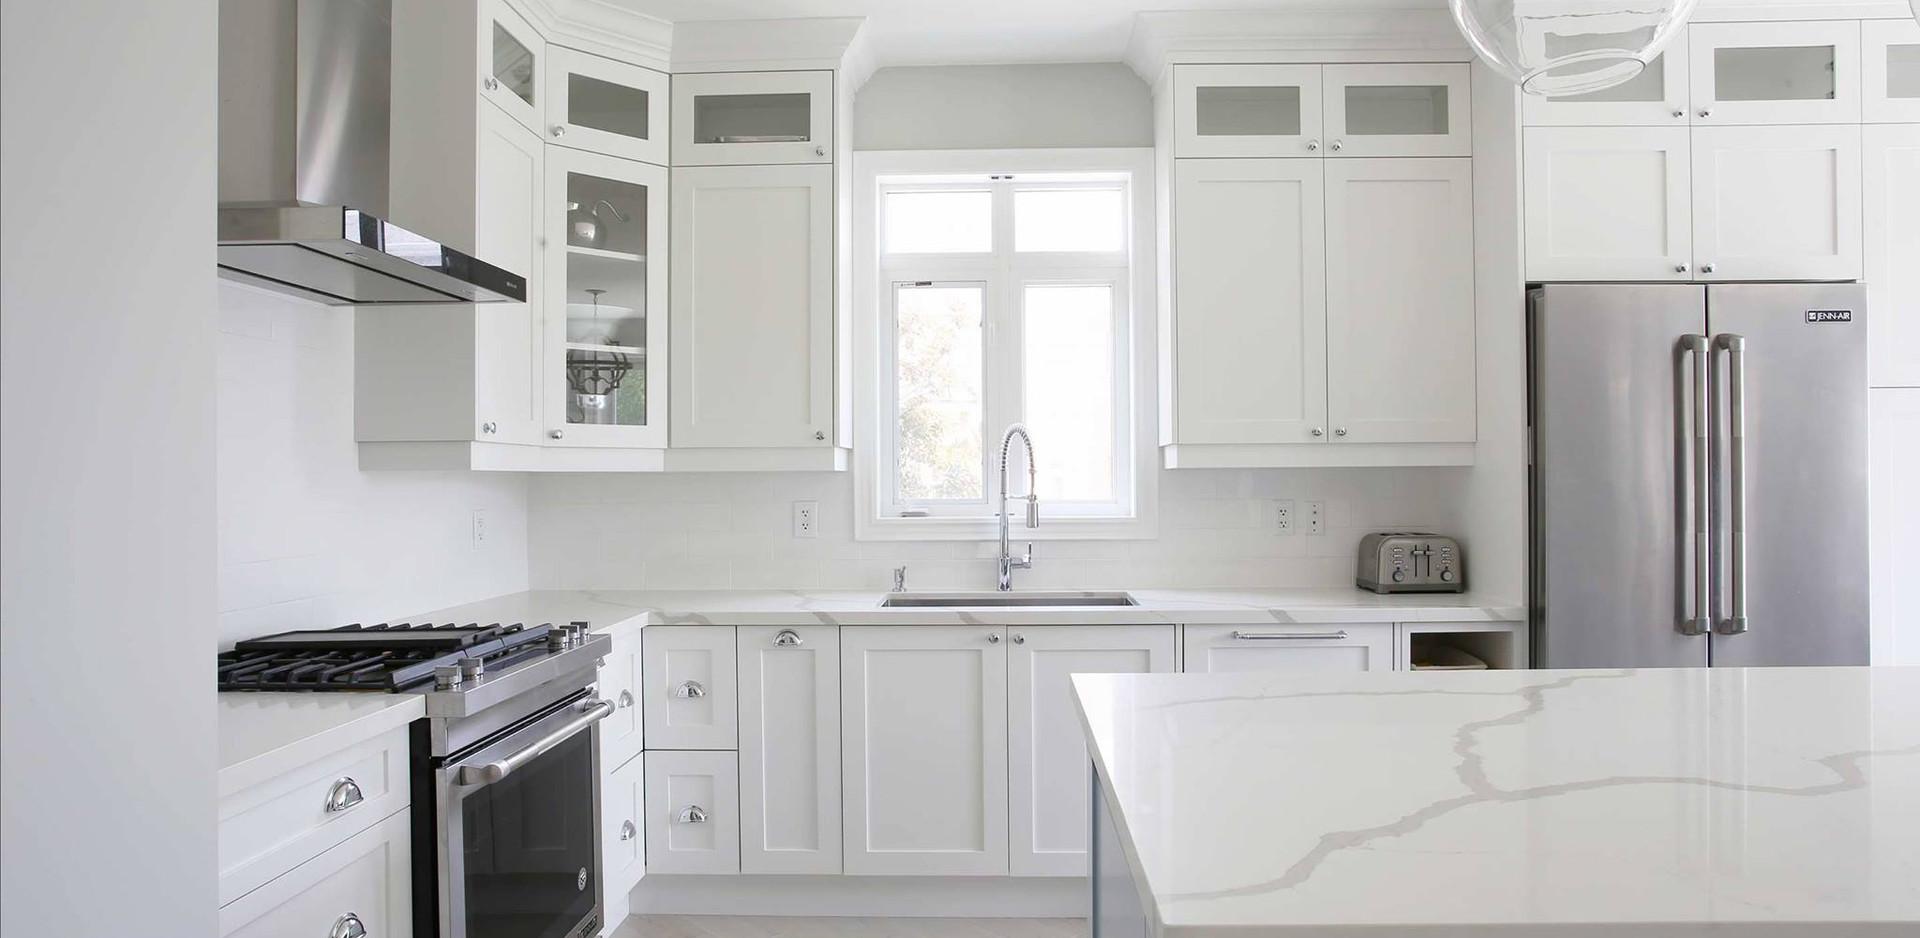 New Kitchen Cabinets, backsplash, and countertops